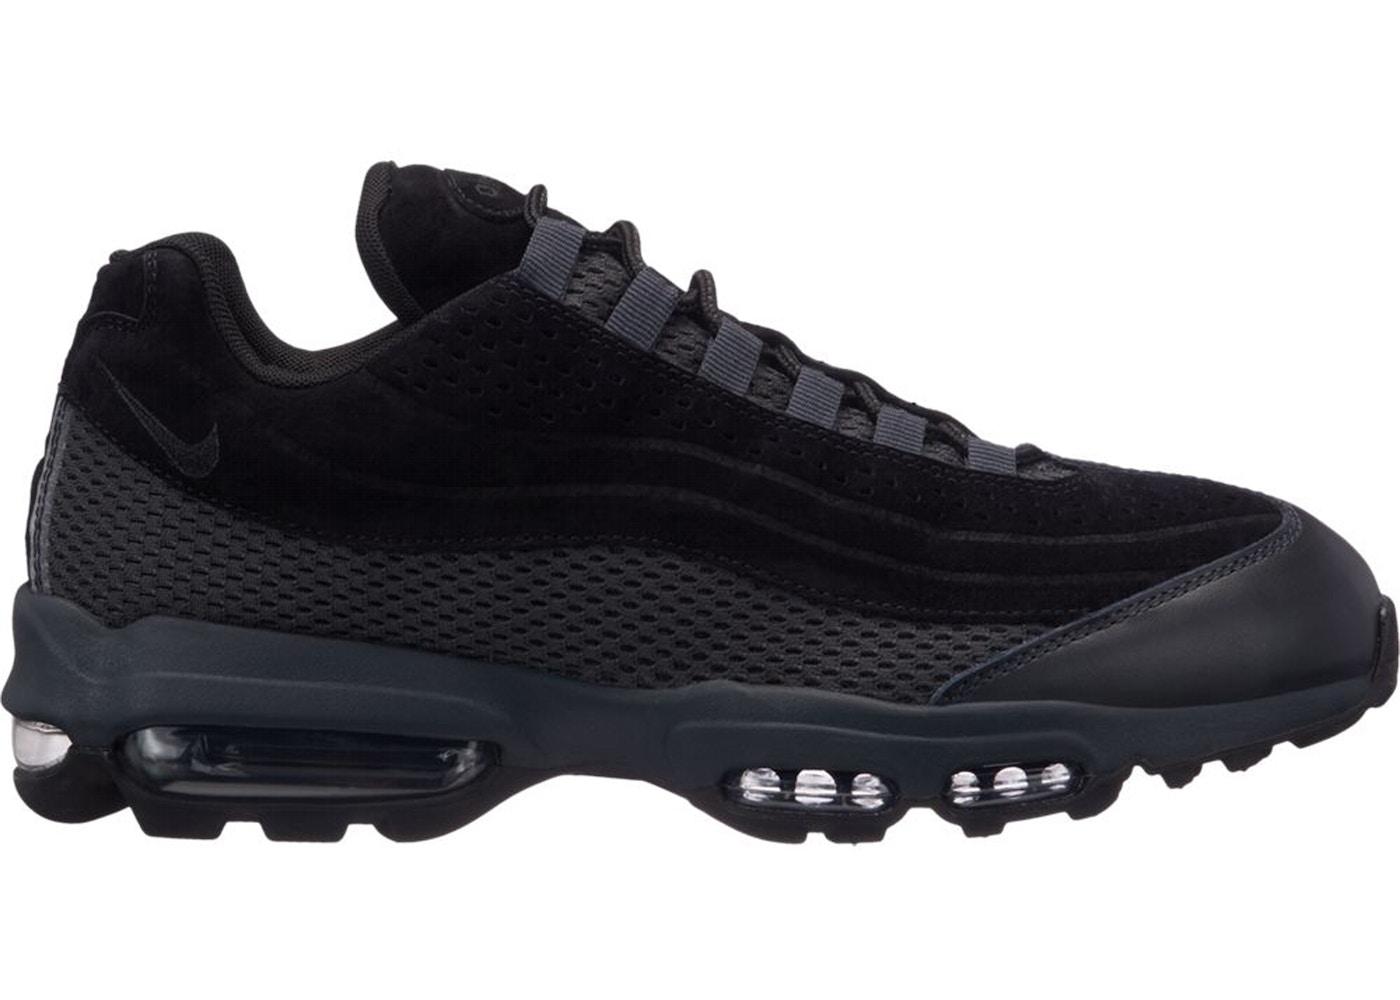 Nike Air Max 95 Ultra Premium Breathe Triple Black - AO2438-002